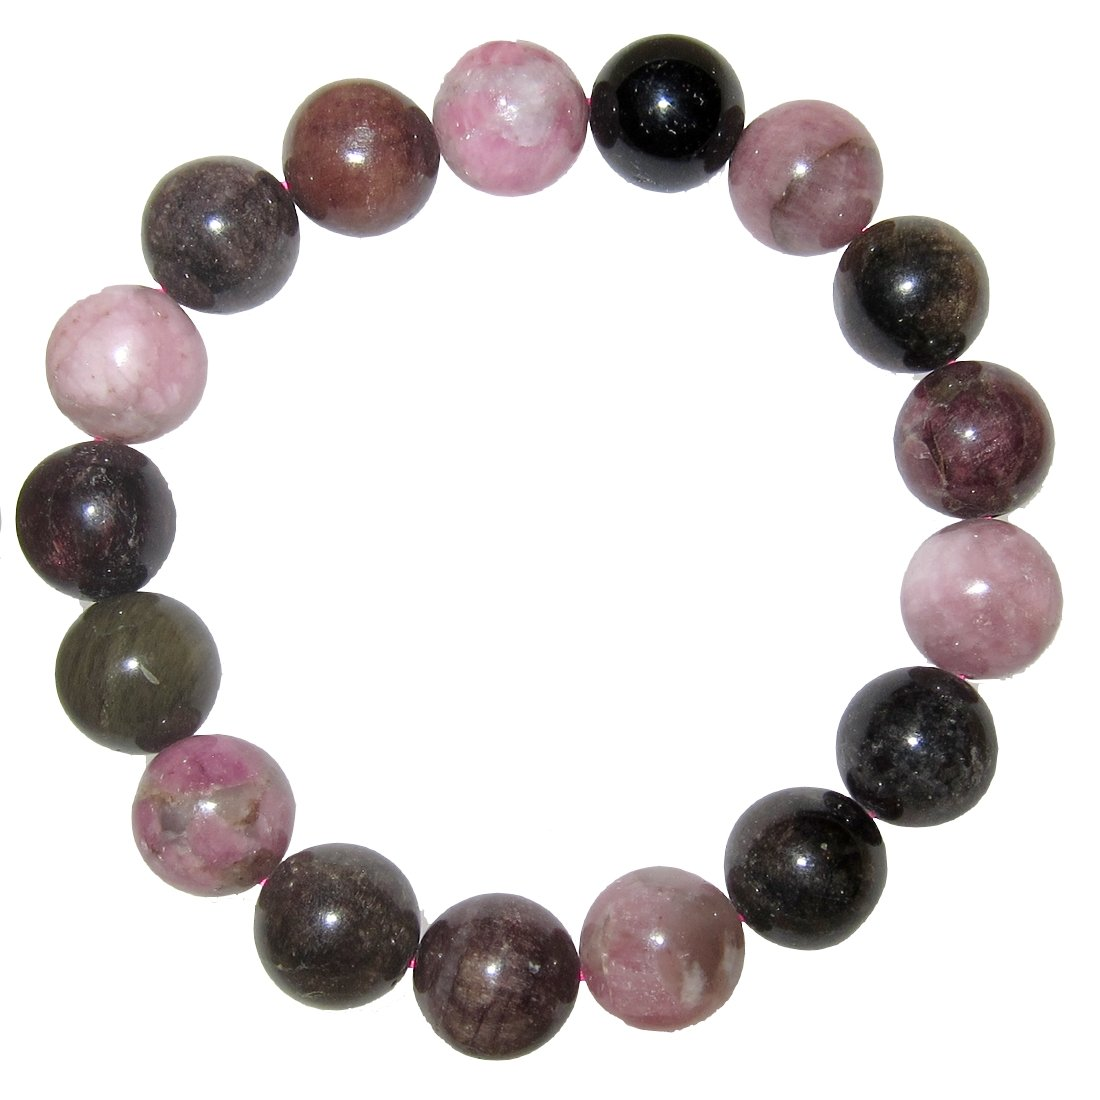 Tourmaline Bracelet Rainbow 12 Mm Gorgeous Natural Pink Black Green Gemstones Deluxe Big Beads (Gift Box) (6.75)